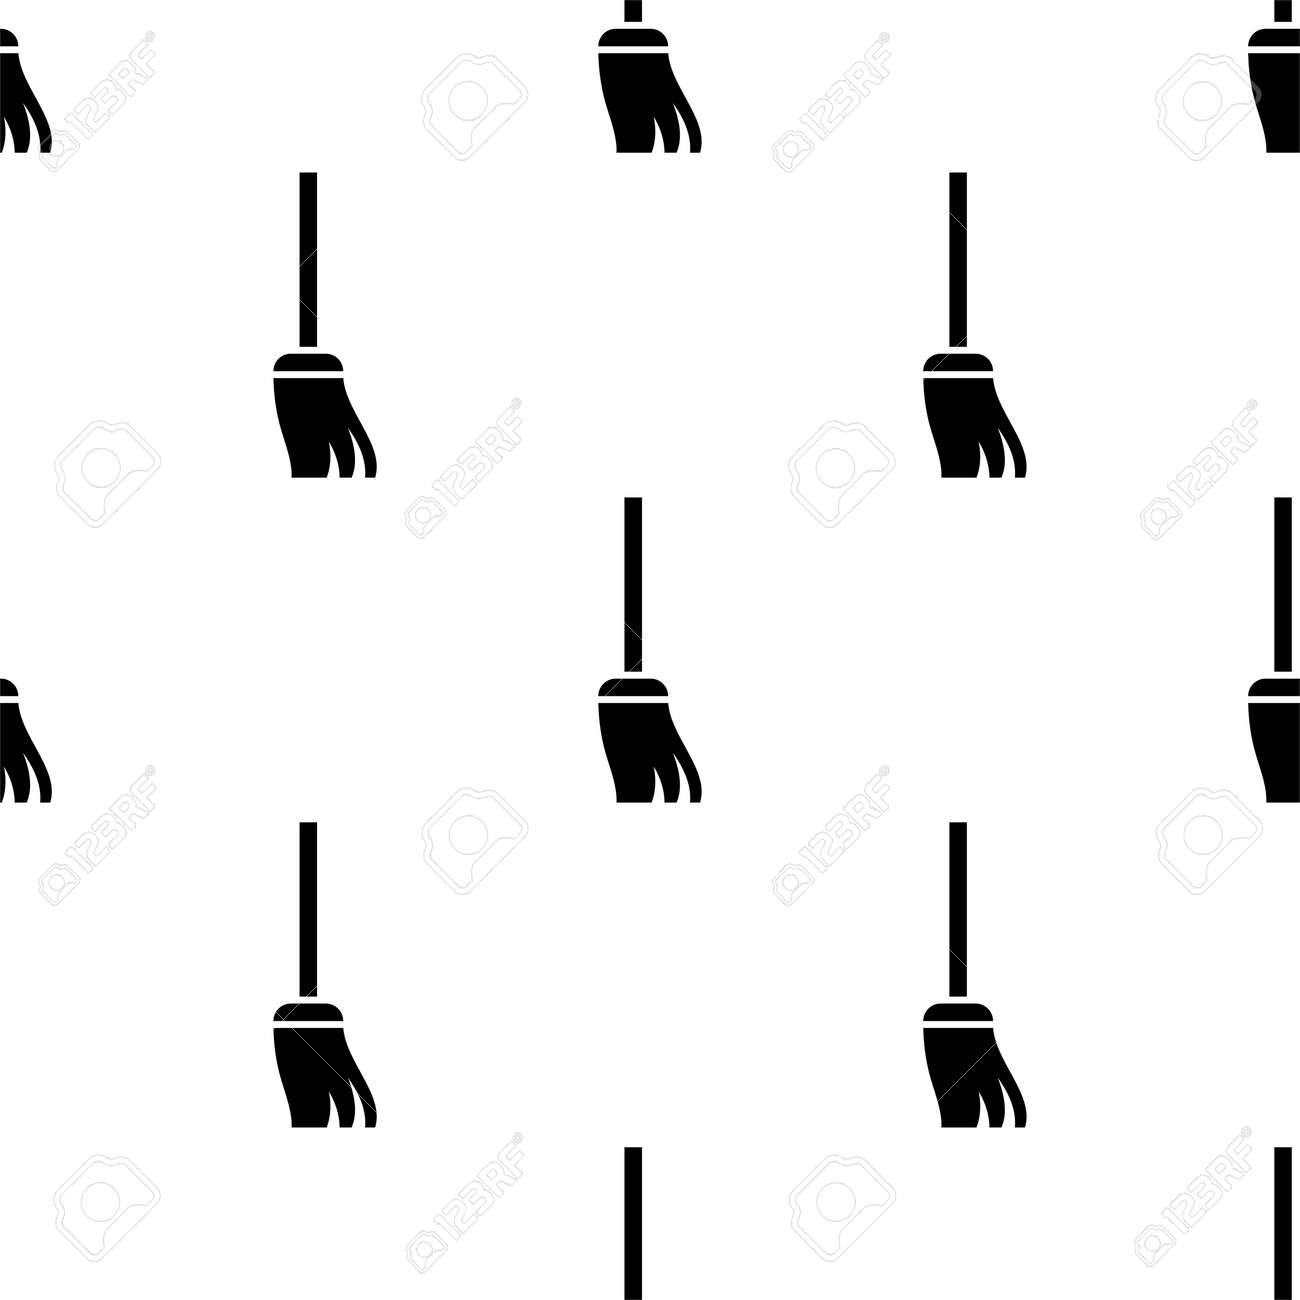 Broom Icon, Cleaning Broom Seamless Pattern Vector Art Illustration - 148090745